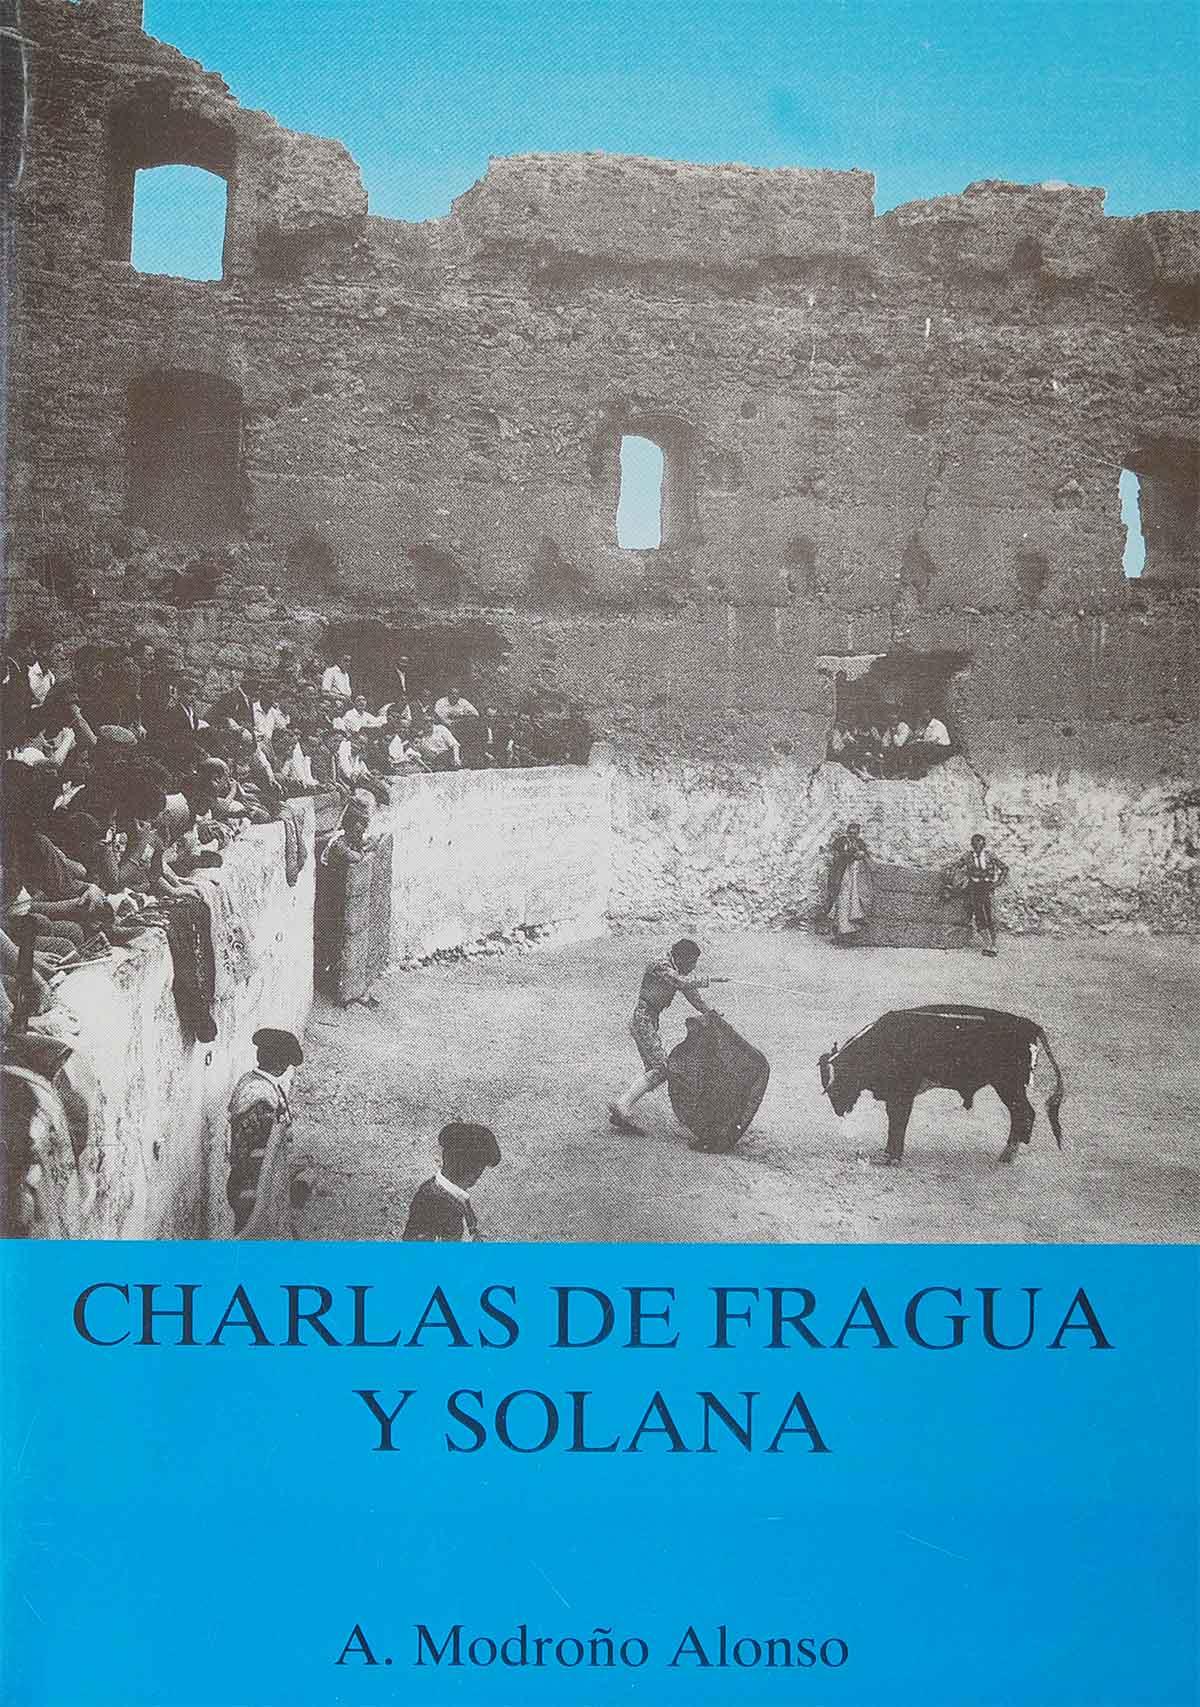 charlas-fragua-solana-agapito-modrono-alonso-editorial-semuret